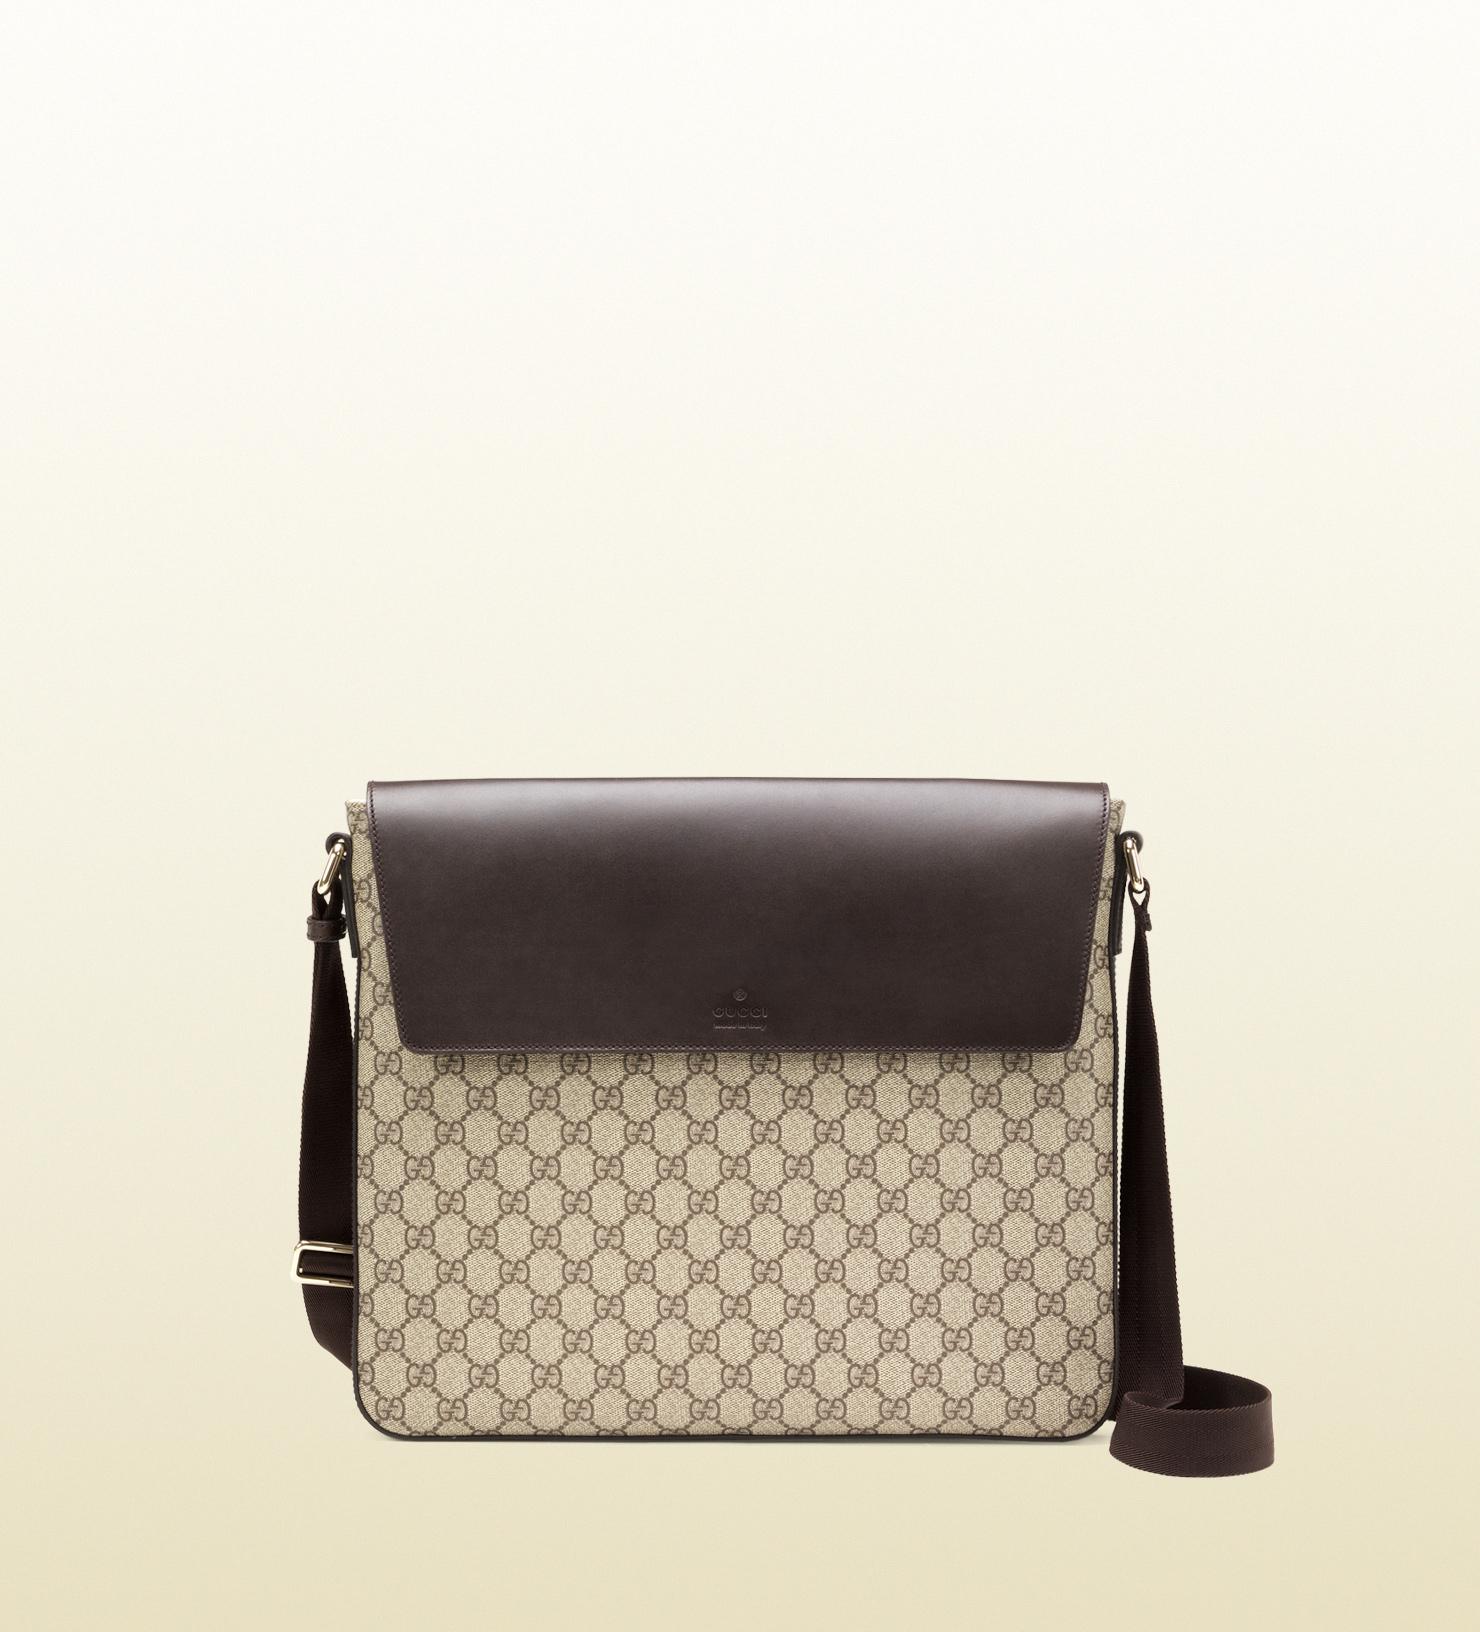 670c97049ac2 Lyst - Gucci Gg Supreme Canvas Messenger Bag in Black for Men